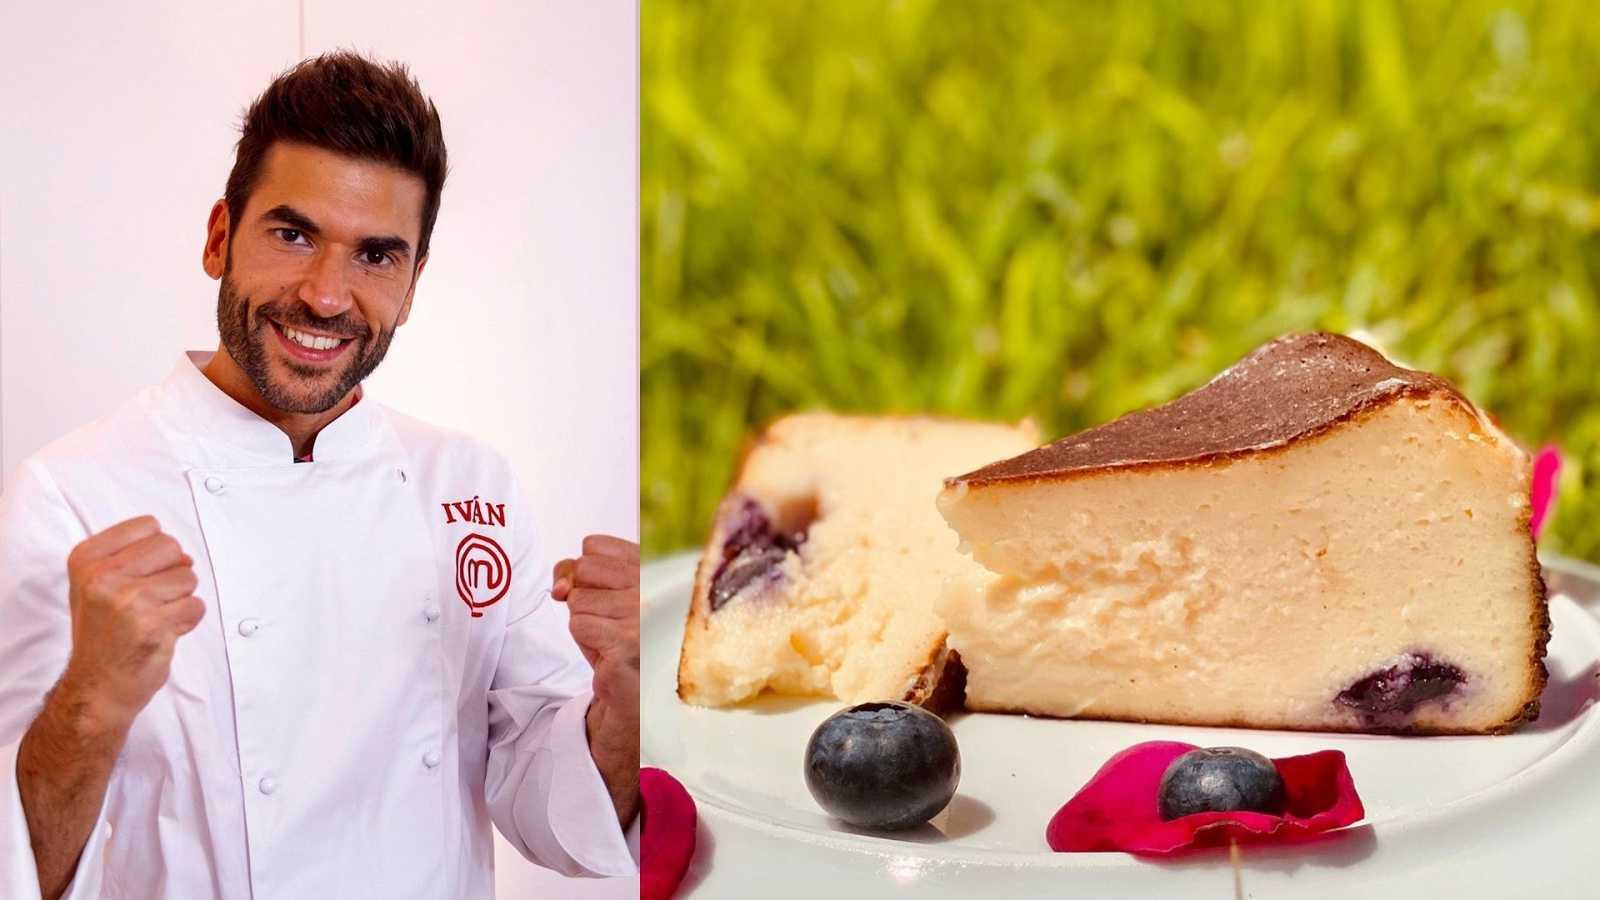 Tarta de queso de Iván de MasterChef